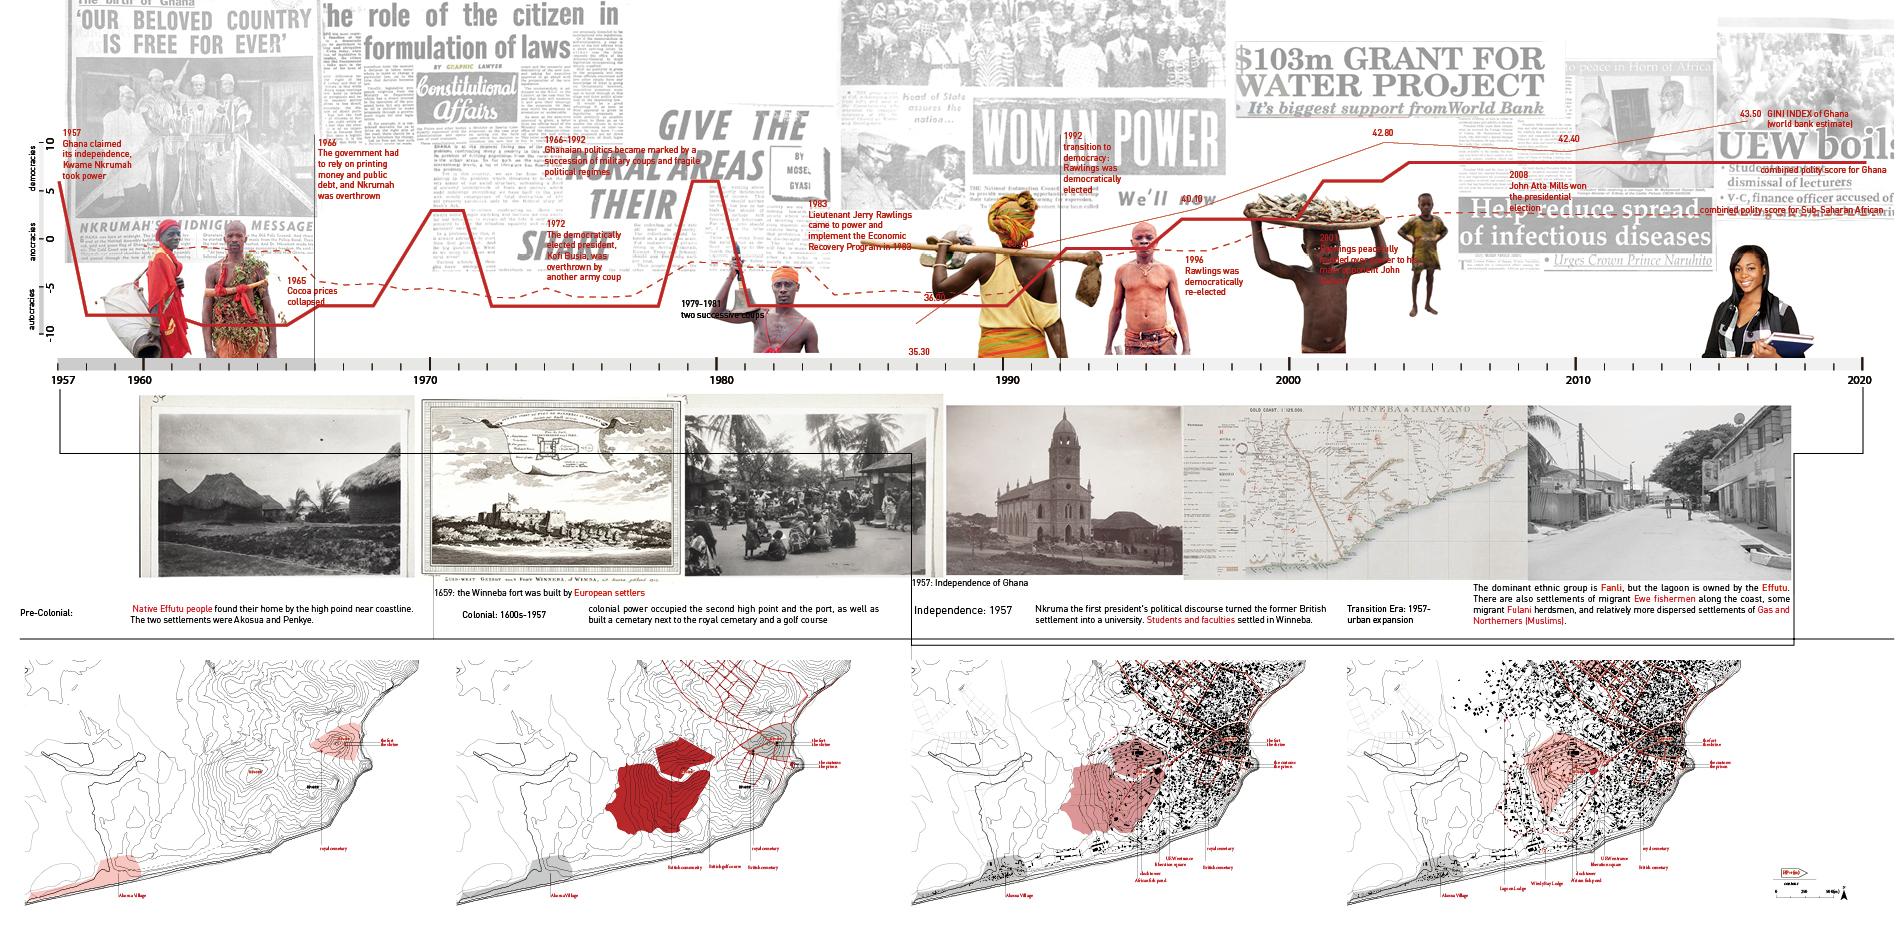 Urbanization and Social Transition